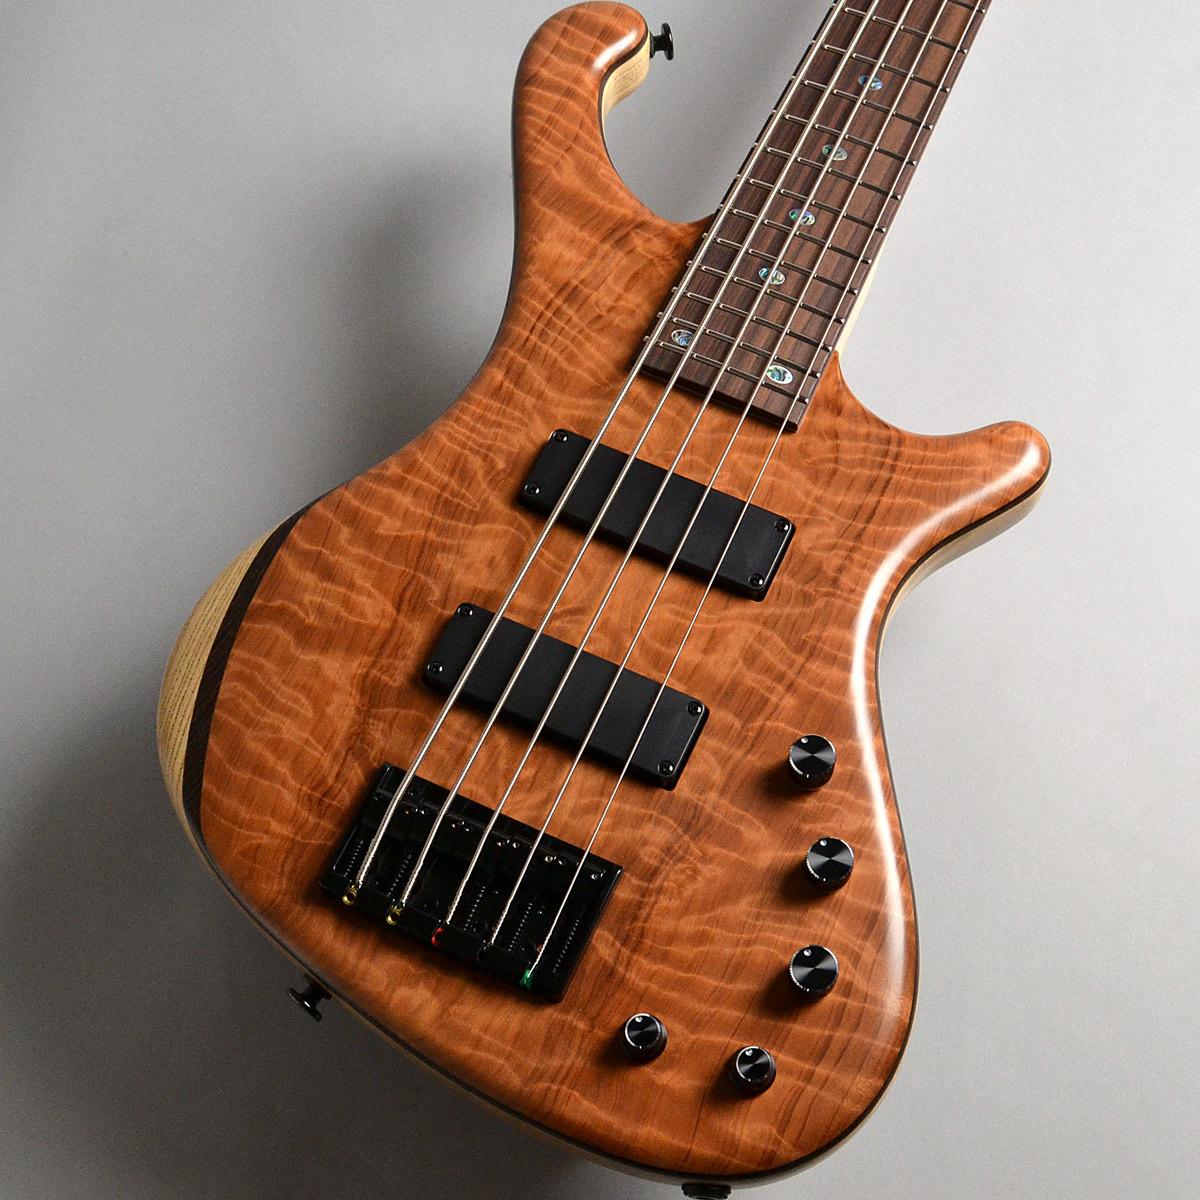 Freedom Custom Guitar Research Dulake Flat 5st Redwood Top Ash エレキベース(5弦) 【フリーダム】【新宿PePe店】